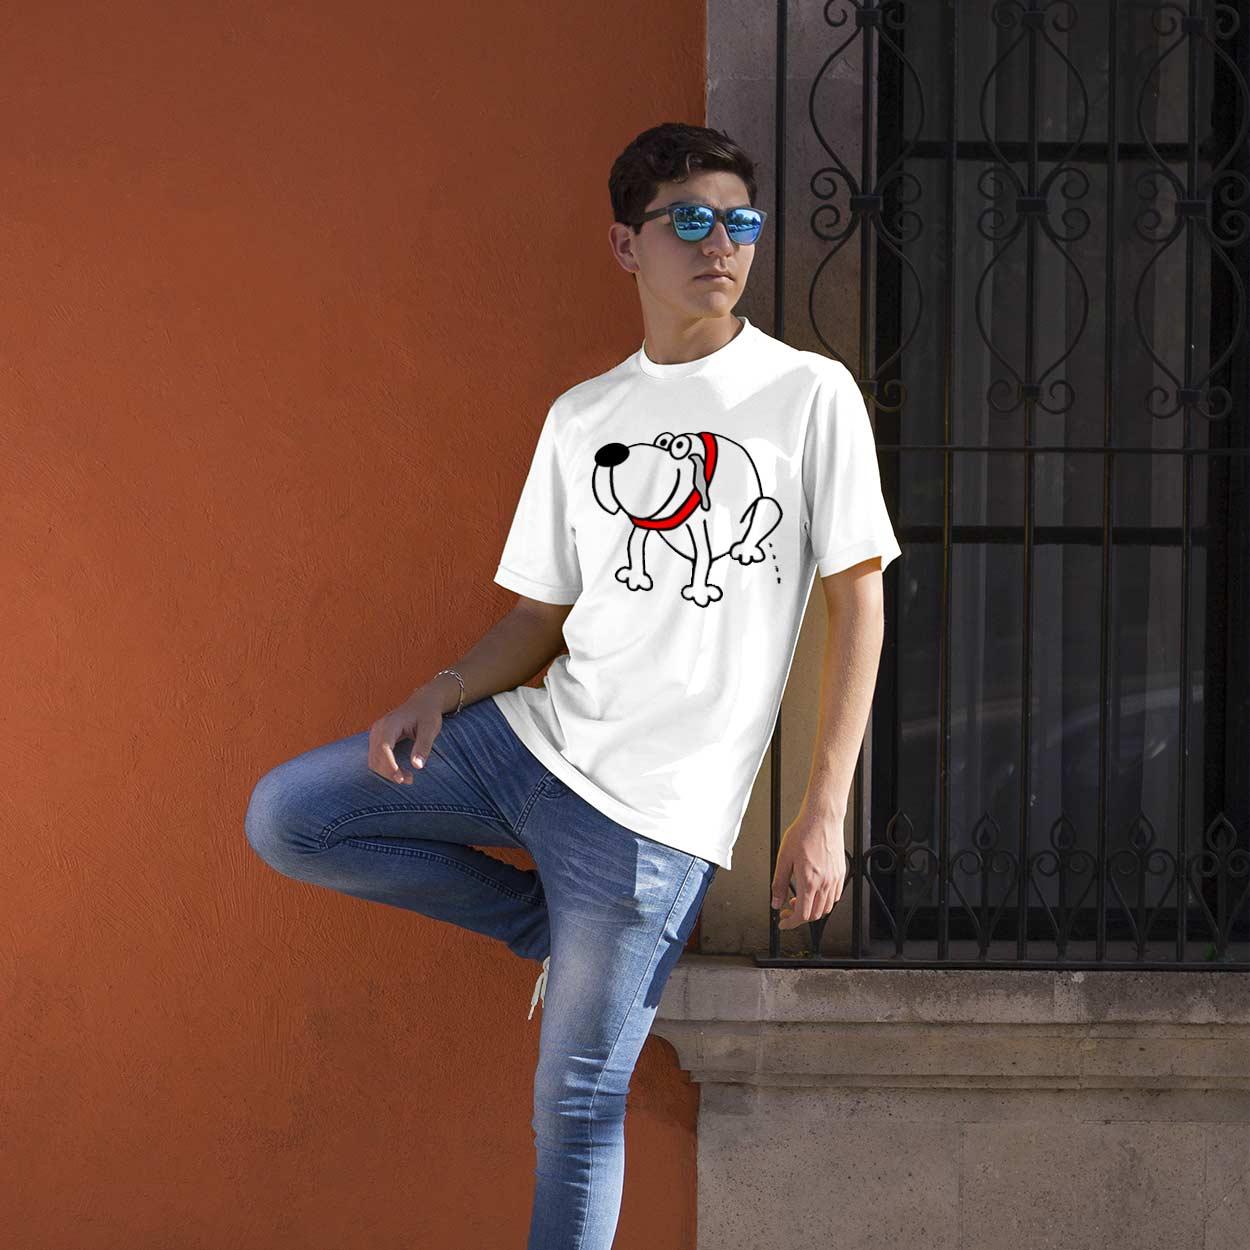 Creative Lisbon T-shirt XIXI de cão